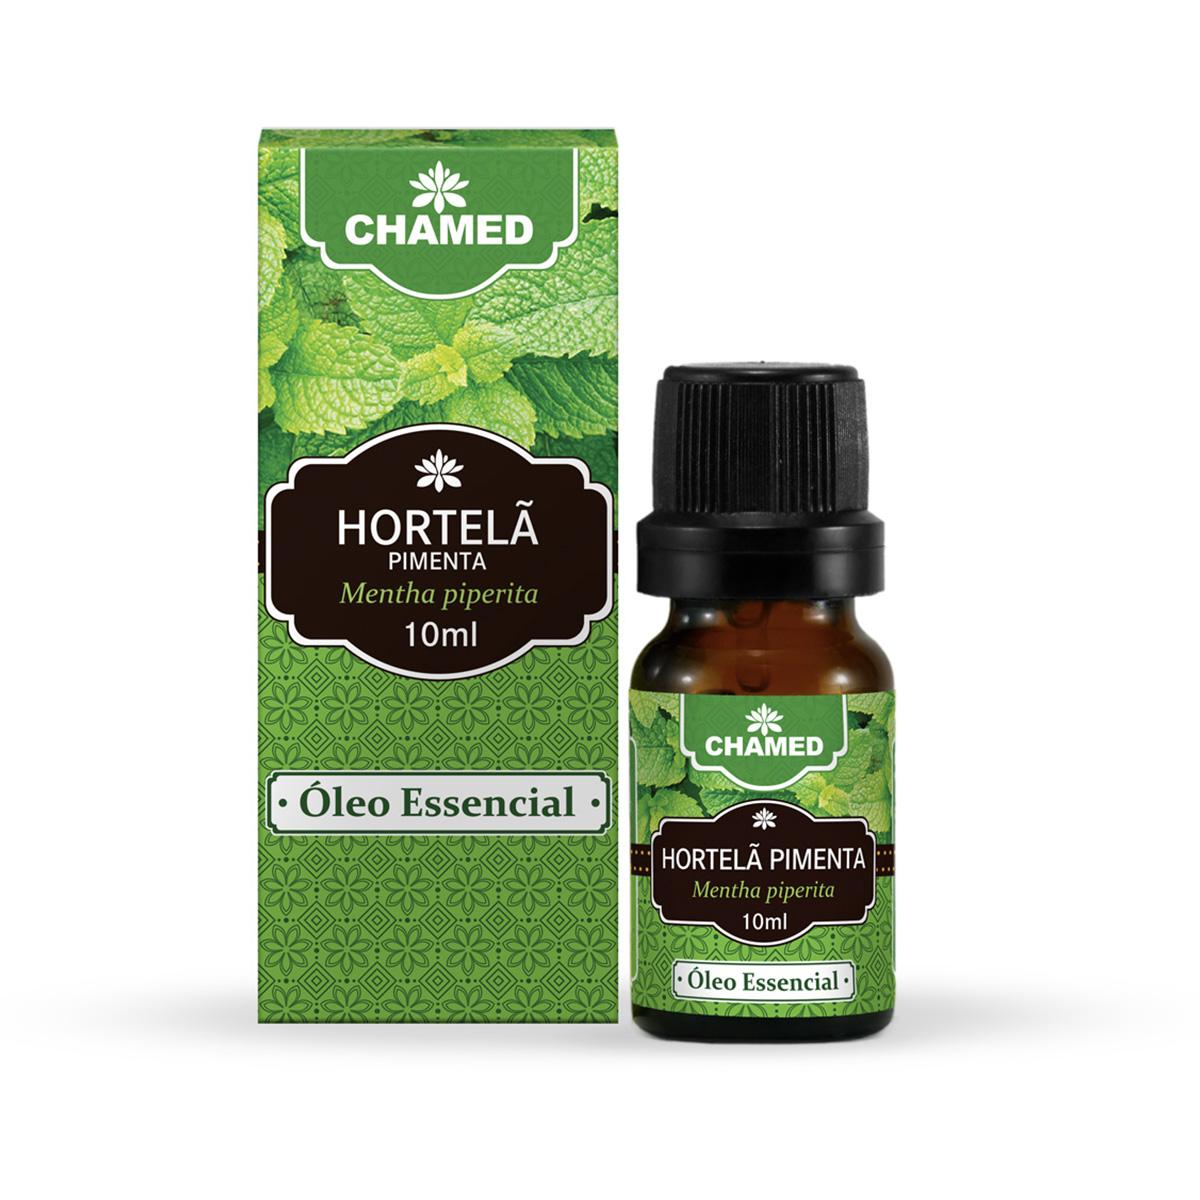 Óleo Essencial de Hortelã 10ml - Chamel